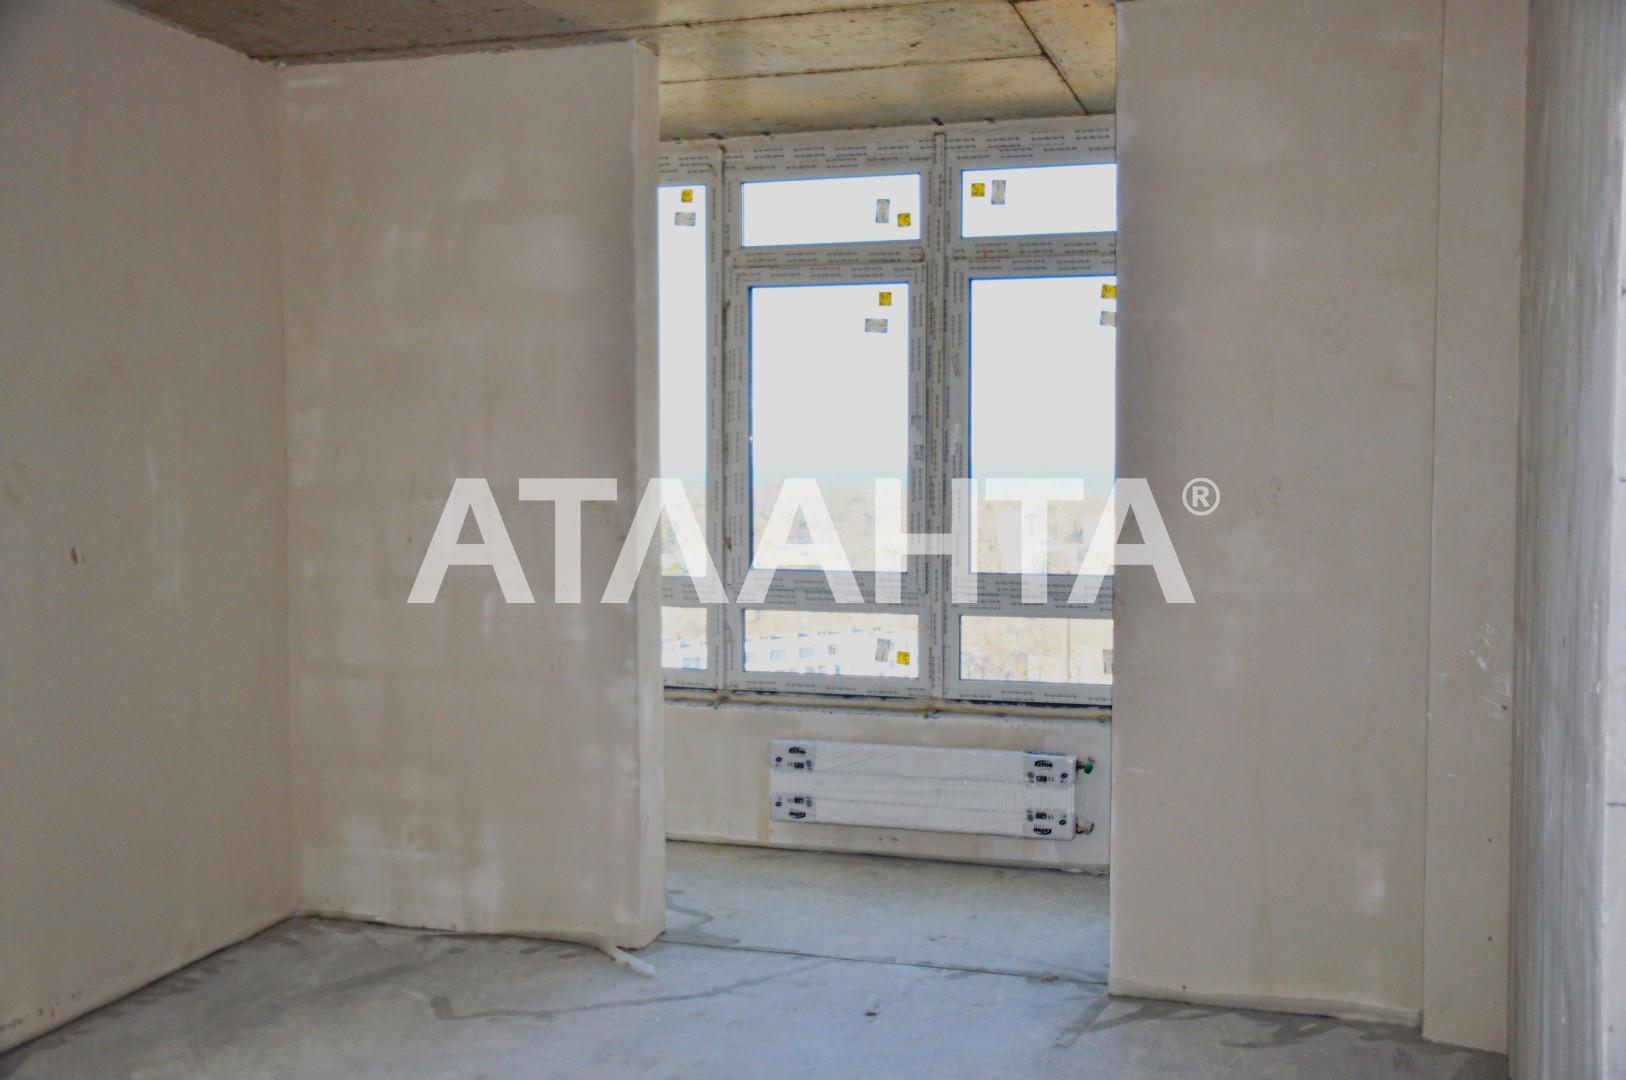 Продается 1-комнатная Квартира на ул. Генуэзская — 48 700 у.е. (фото №2)